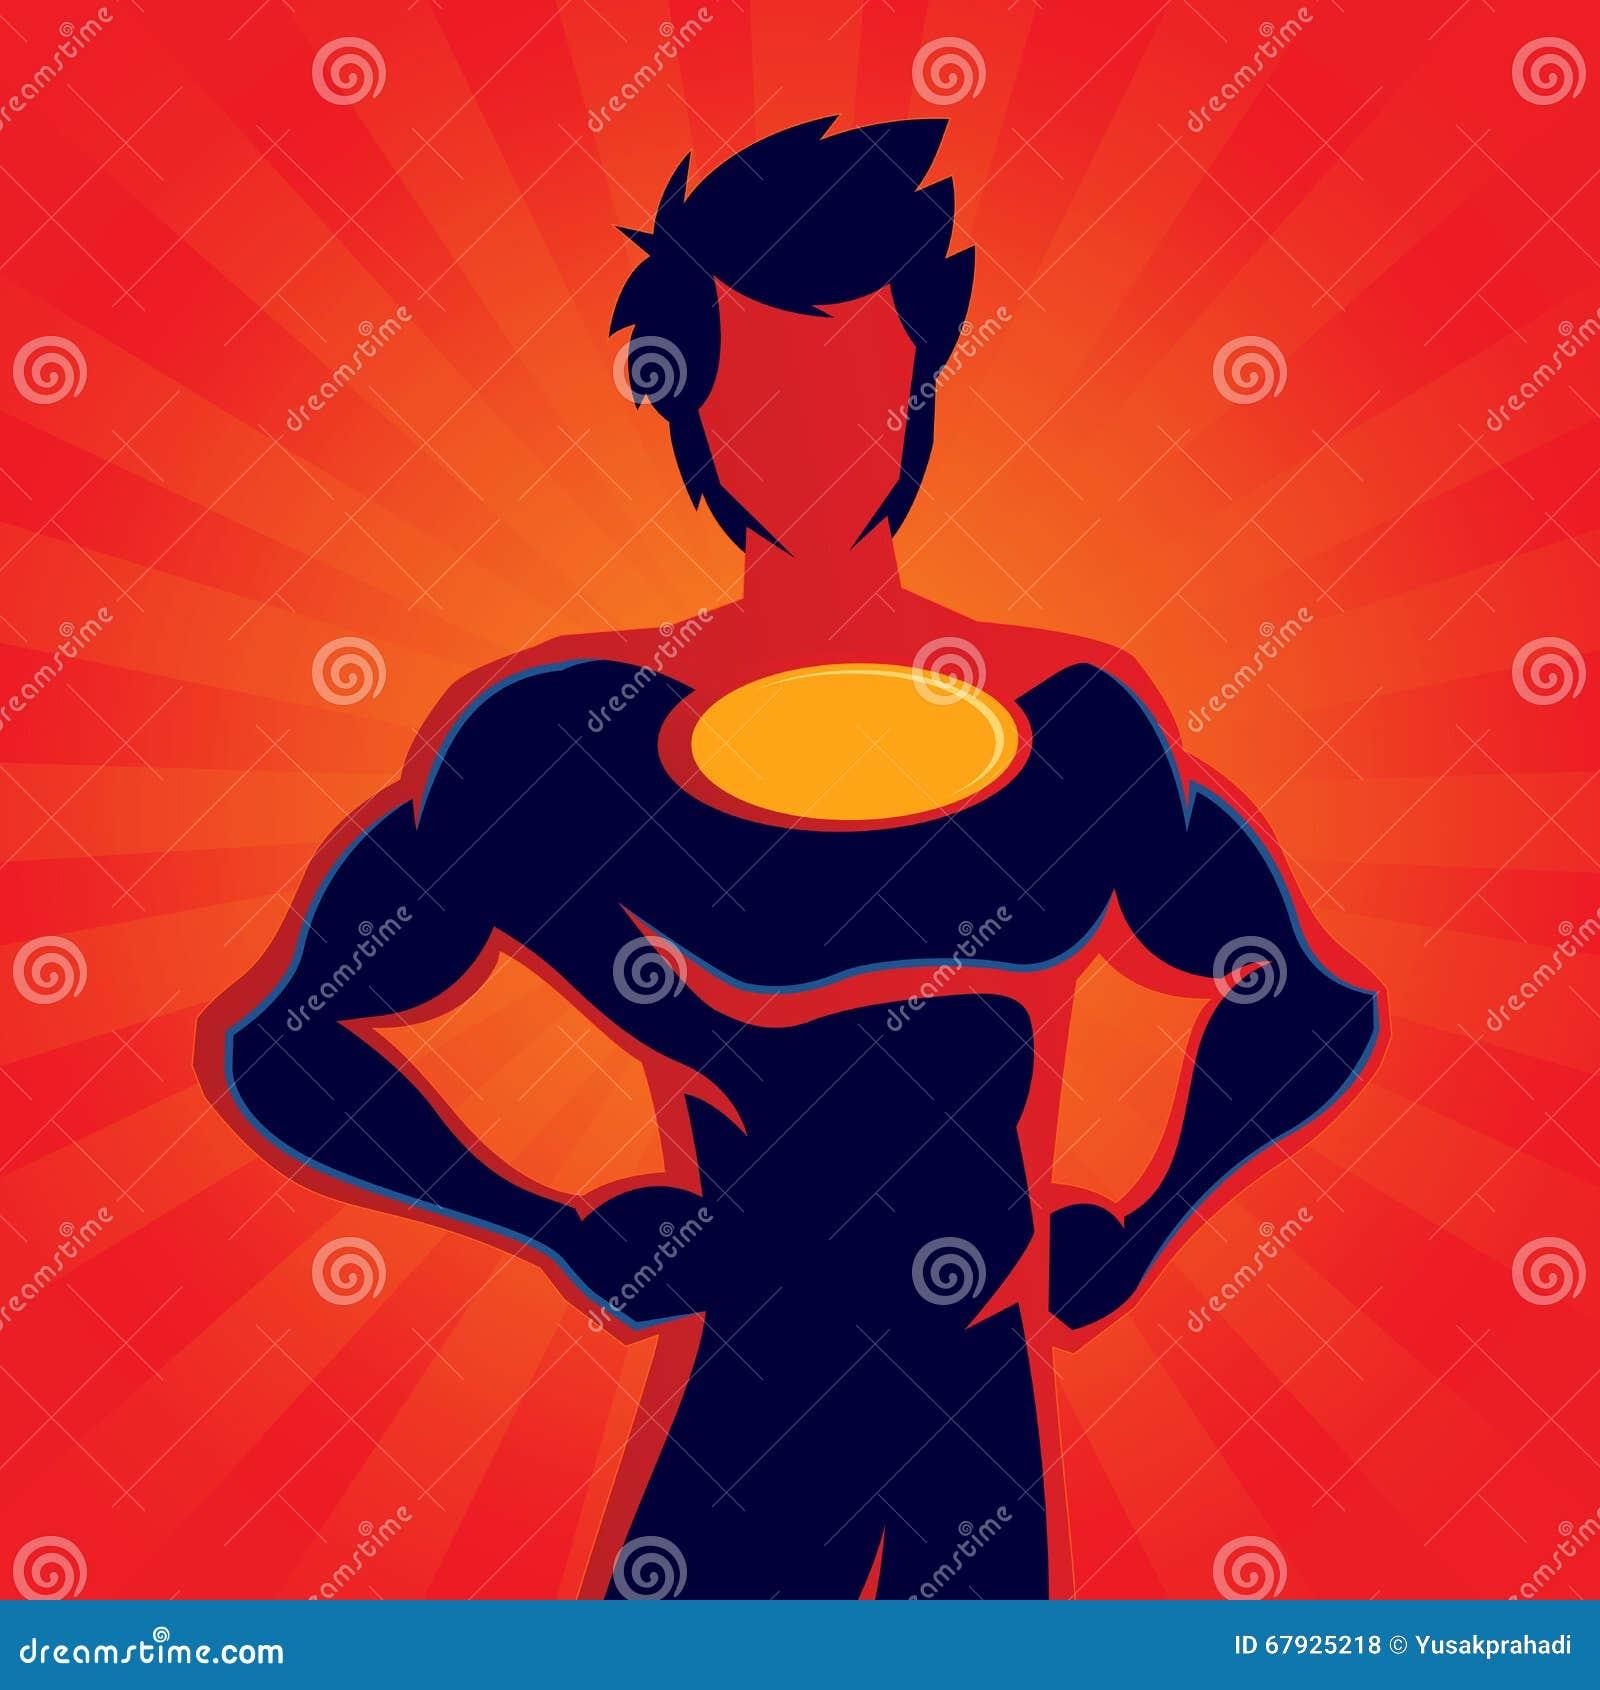 super hero silhouette cartoon vector